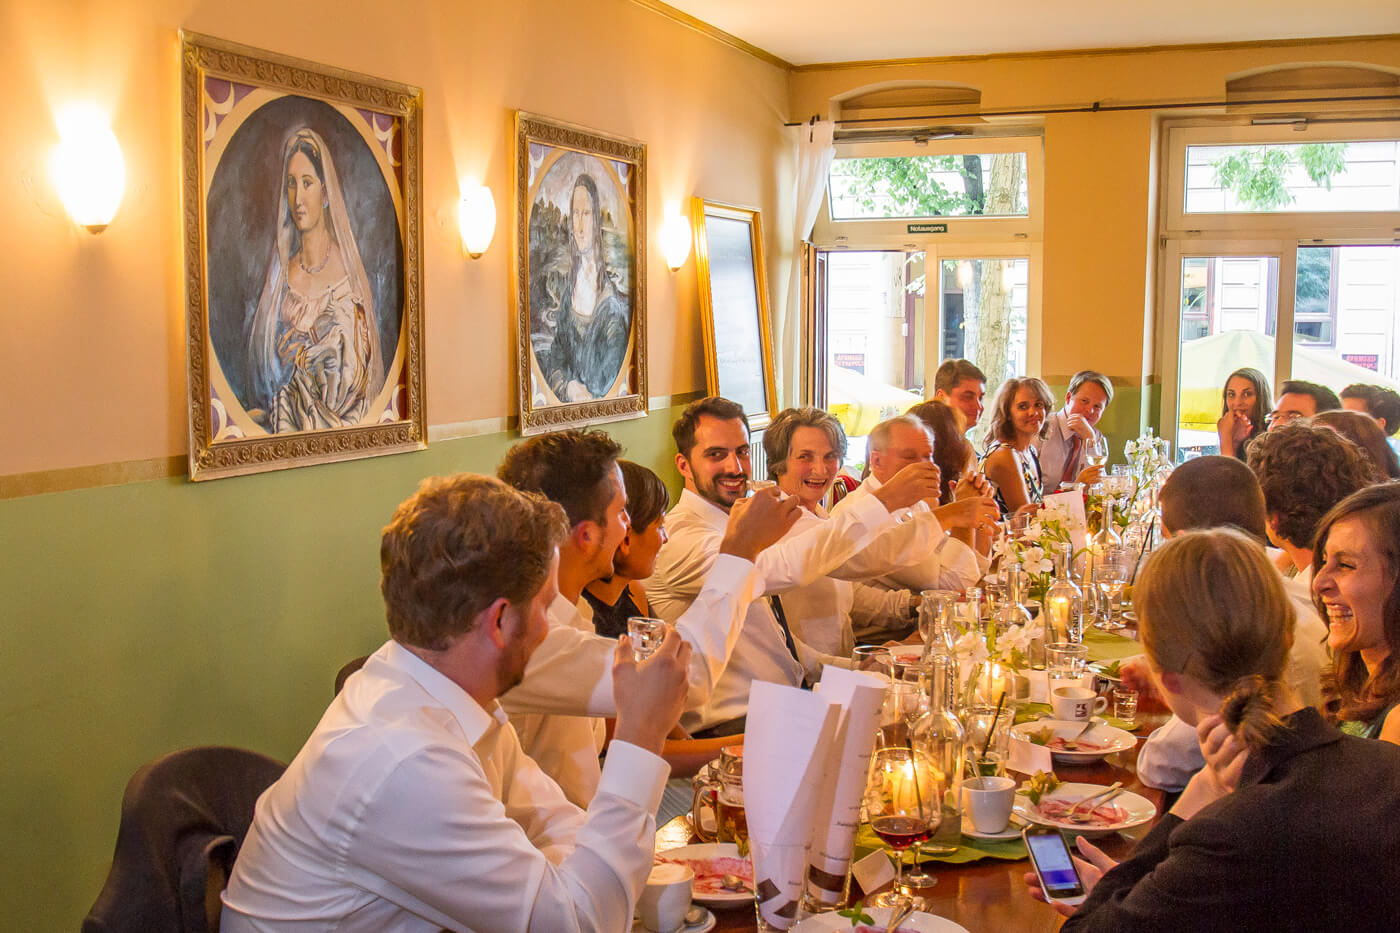 Jolie Restaurant auf St. Pauli, Hamburg